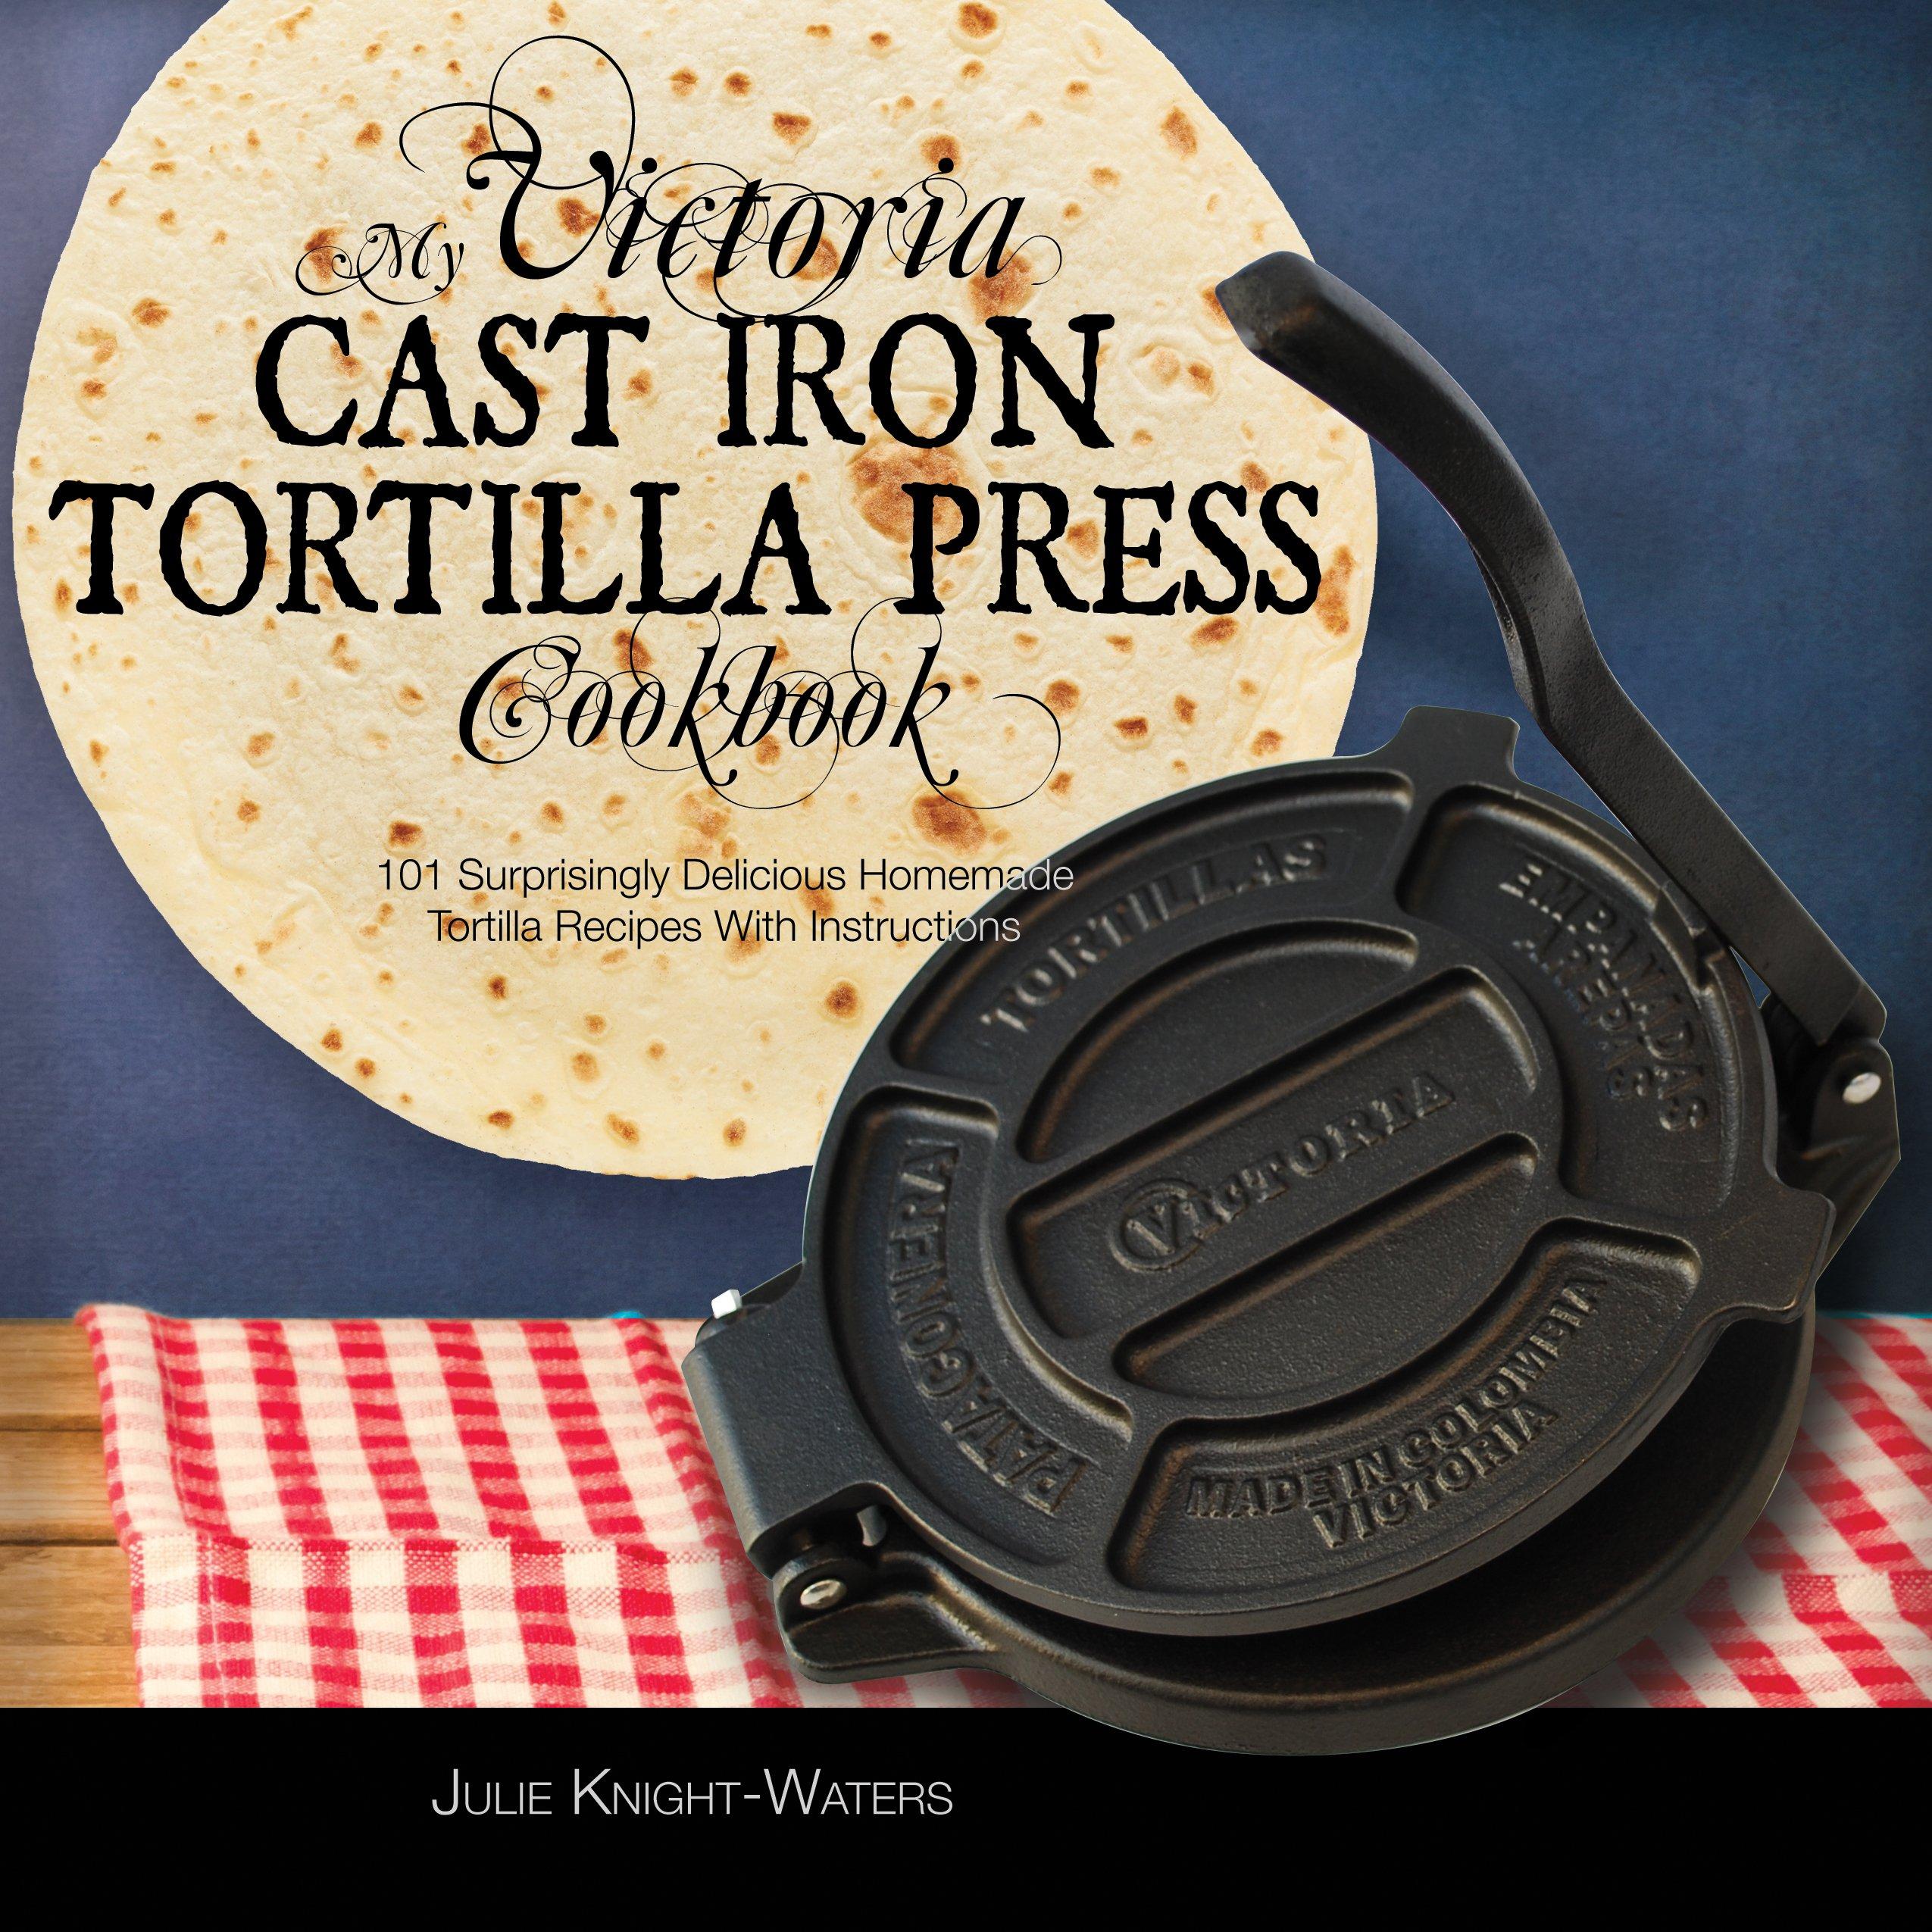 My Victoria Cast Iron Tortilla Press Cookbook  101 Surprisingly Delicious Homemade Tortilla Recipes With Instructions  Victoria Cast Iron Tortilla Press Recipes Book 1   English Edition